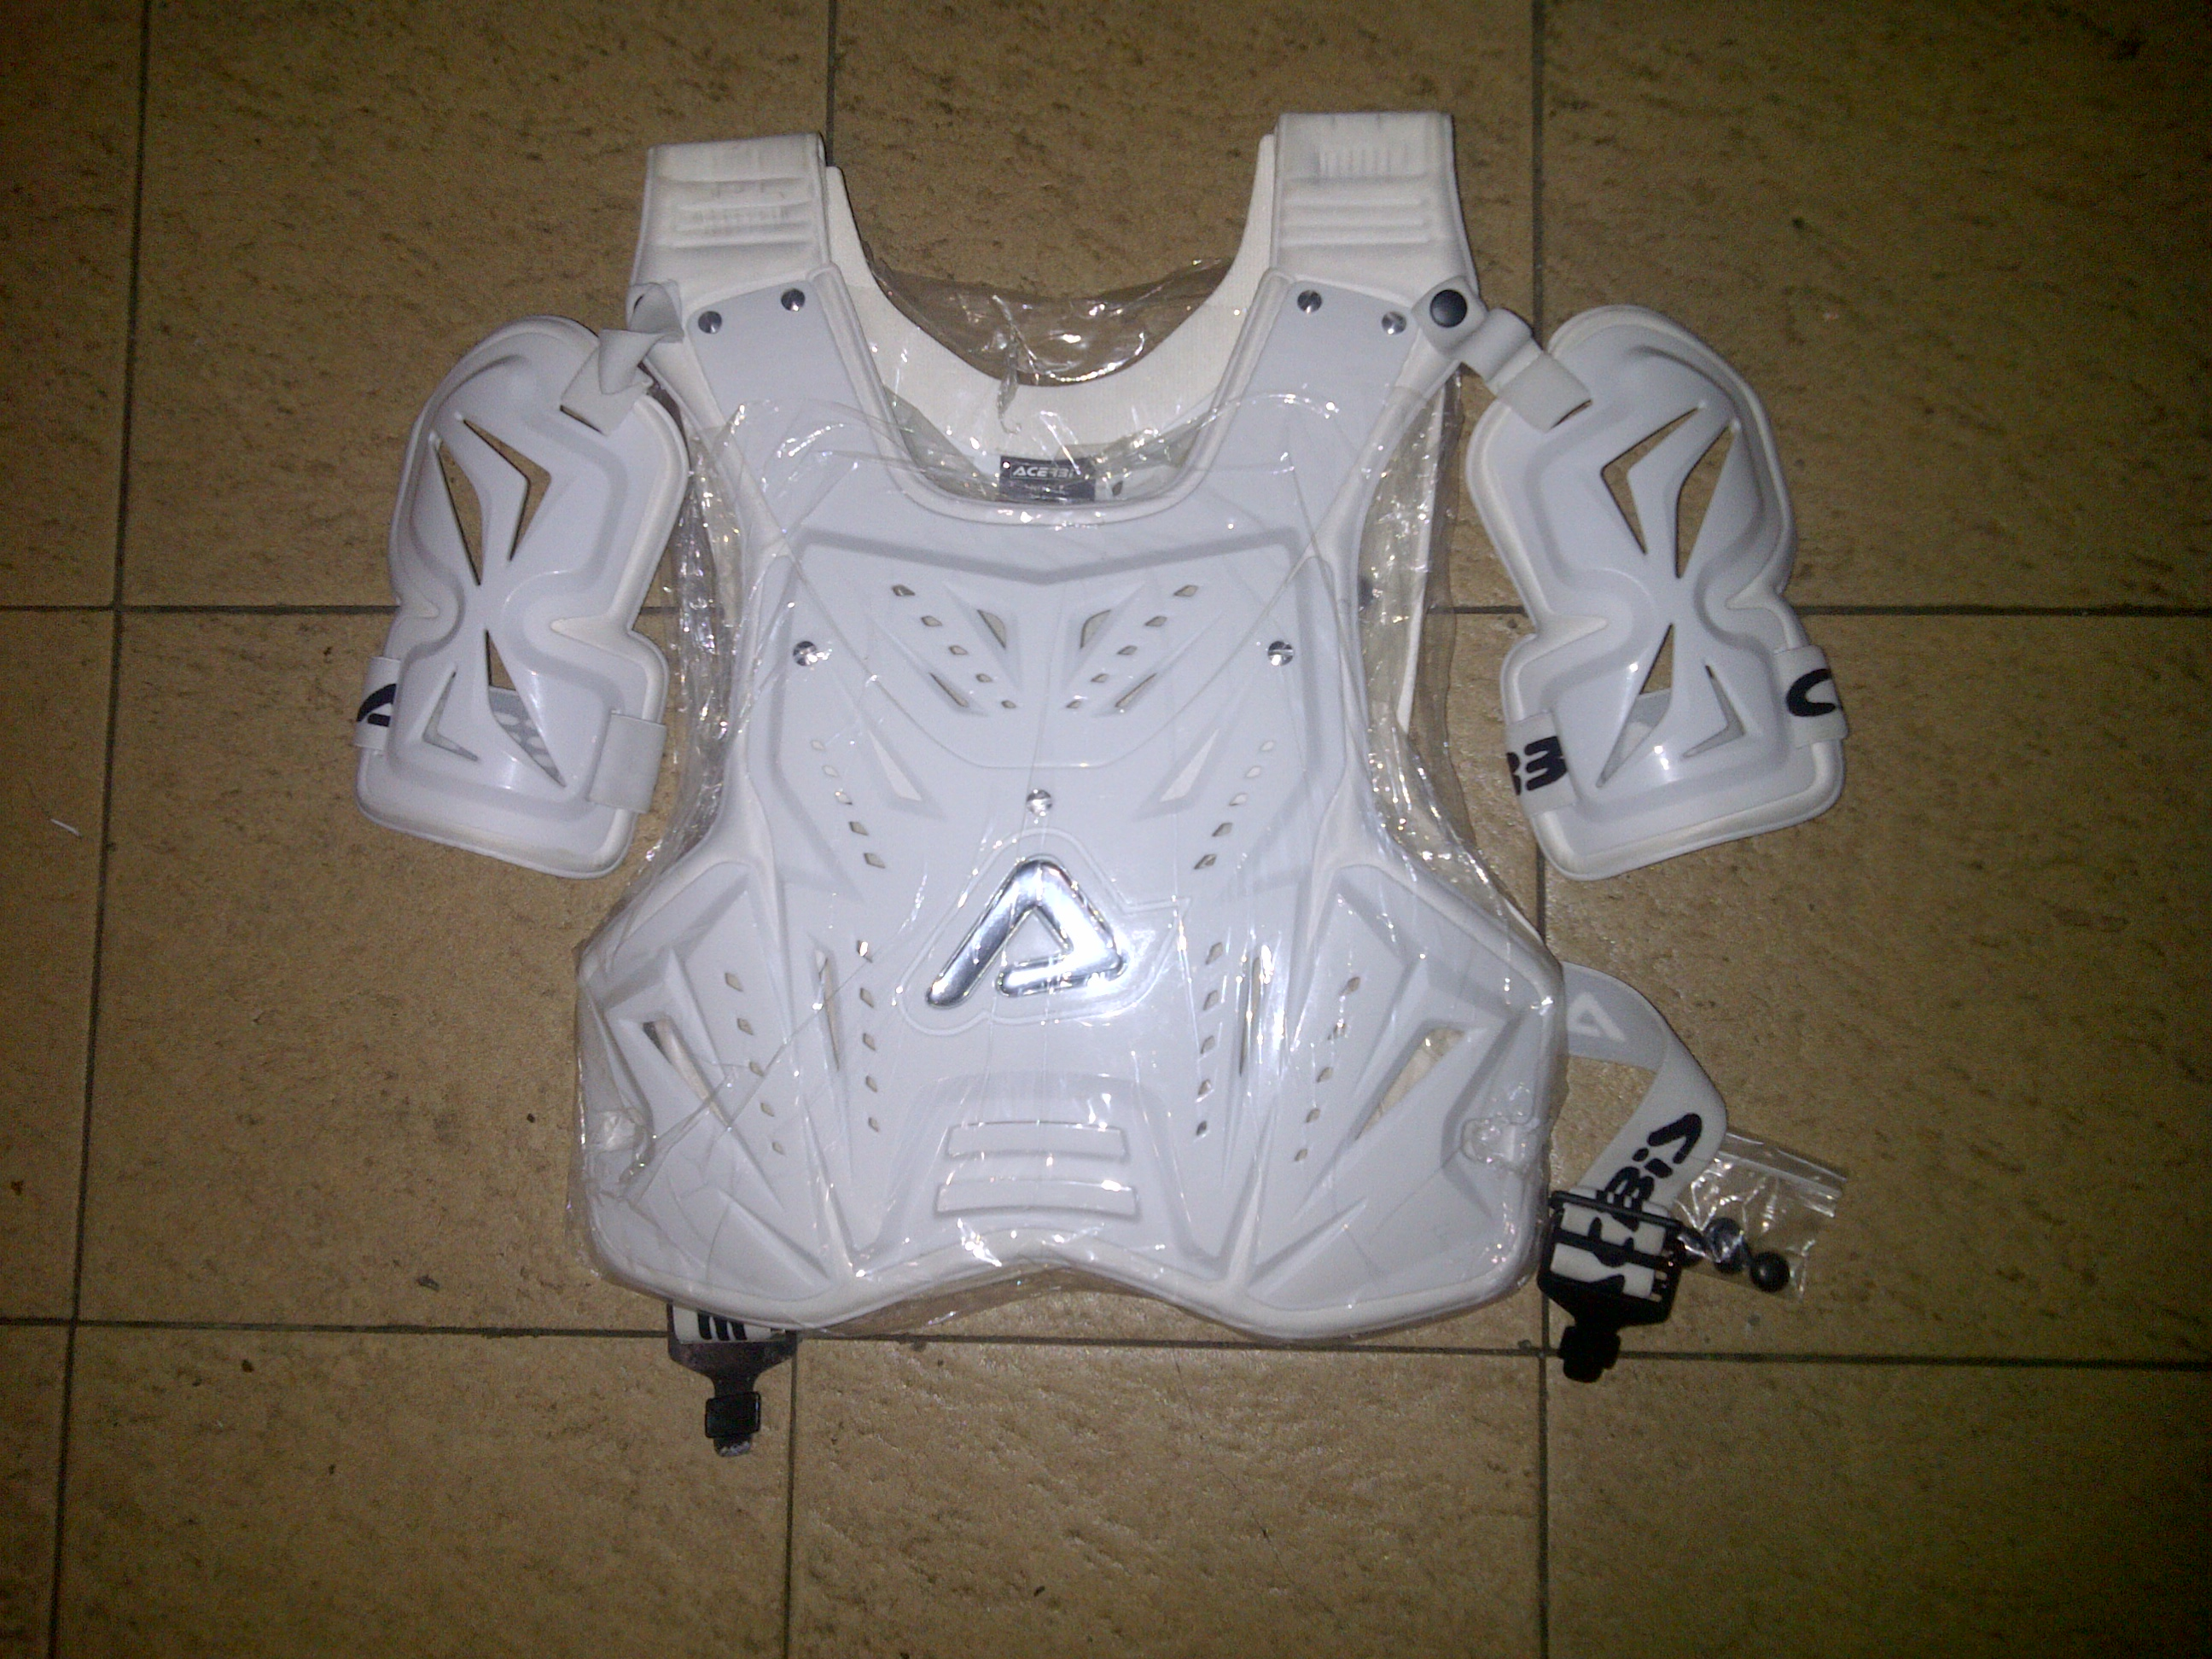 IMG 20130523 00348 Jual body protector   merk acerbis